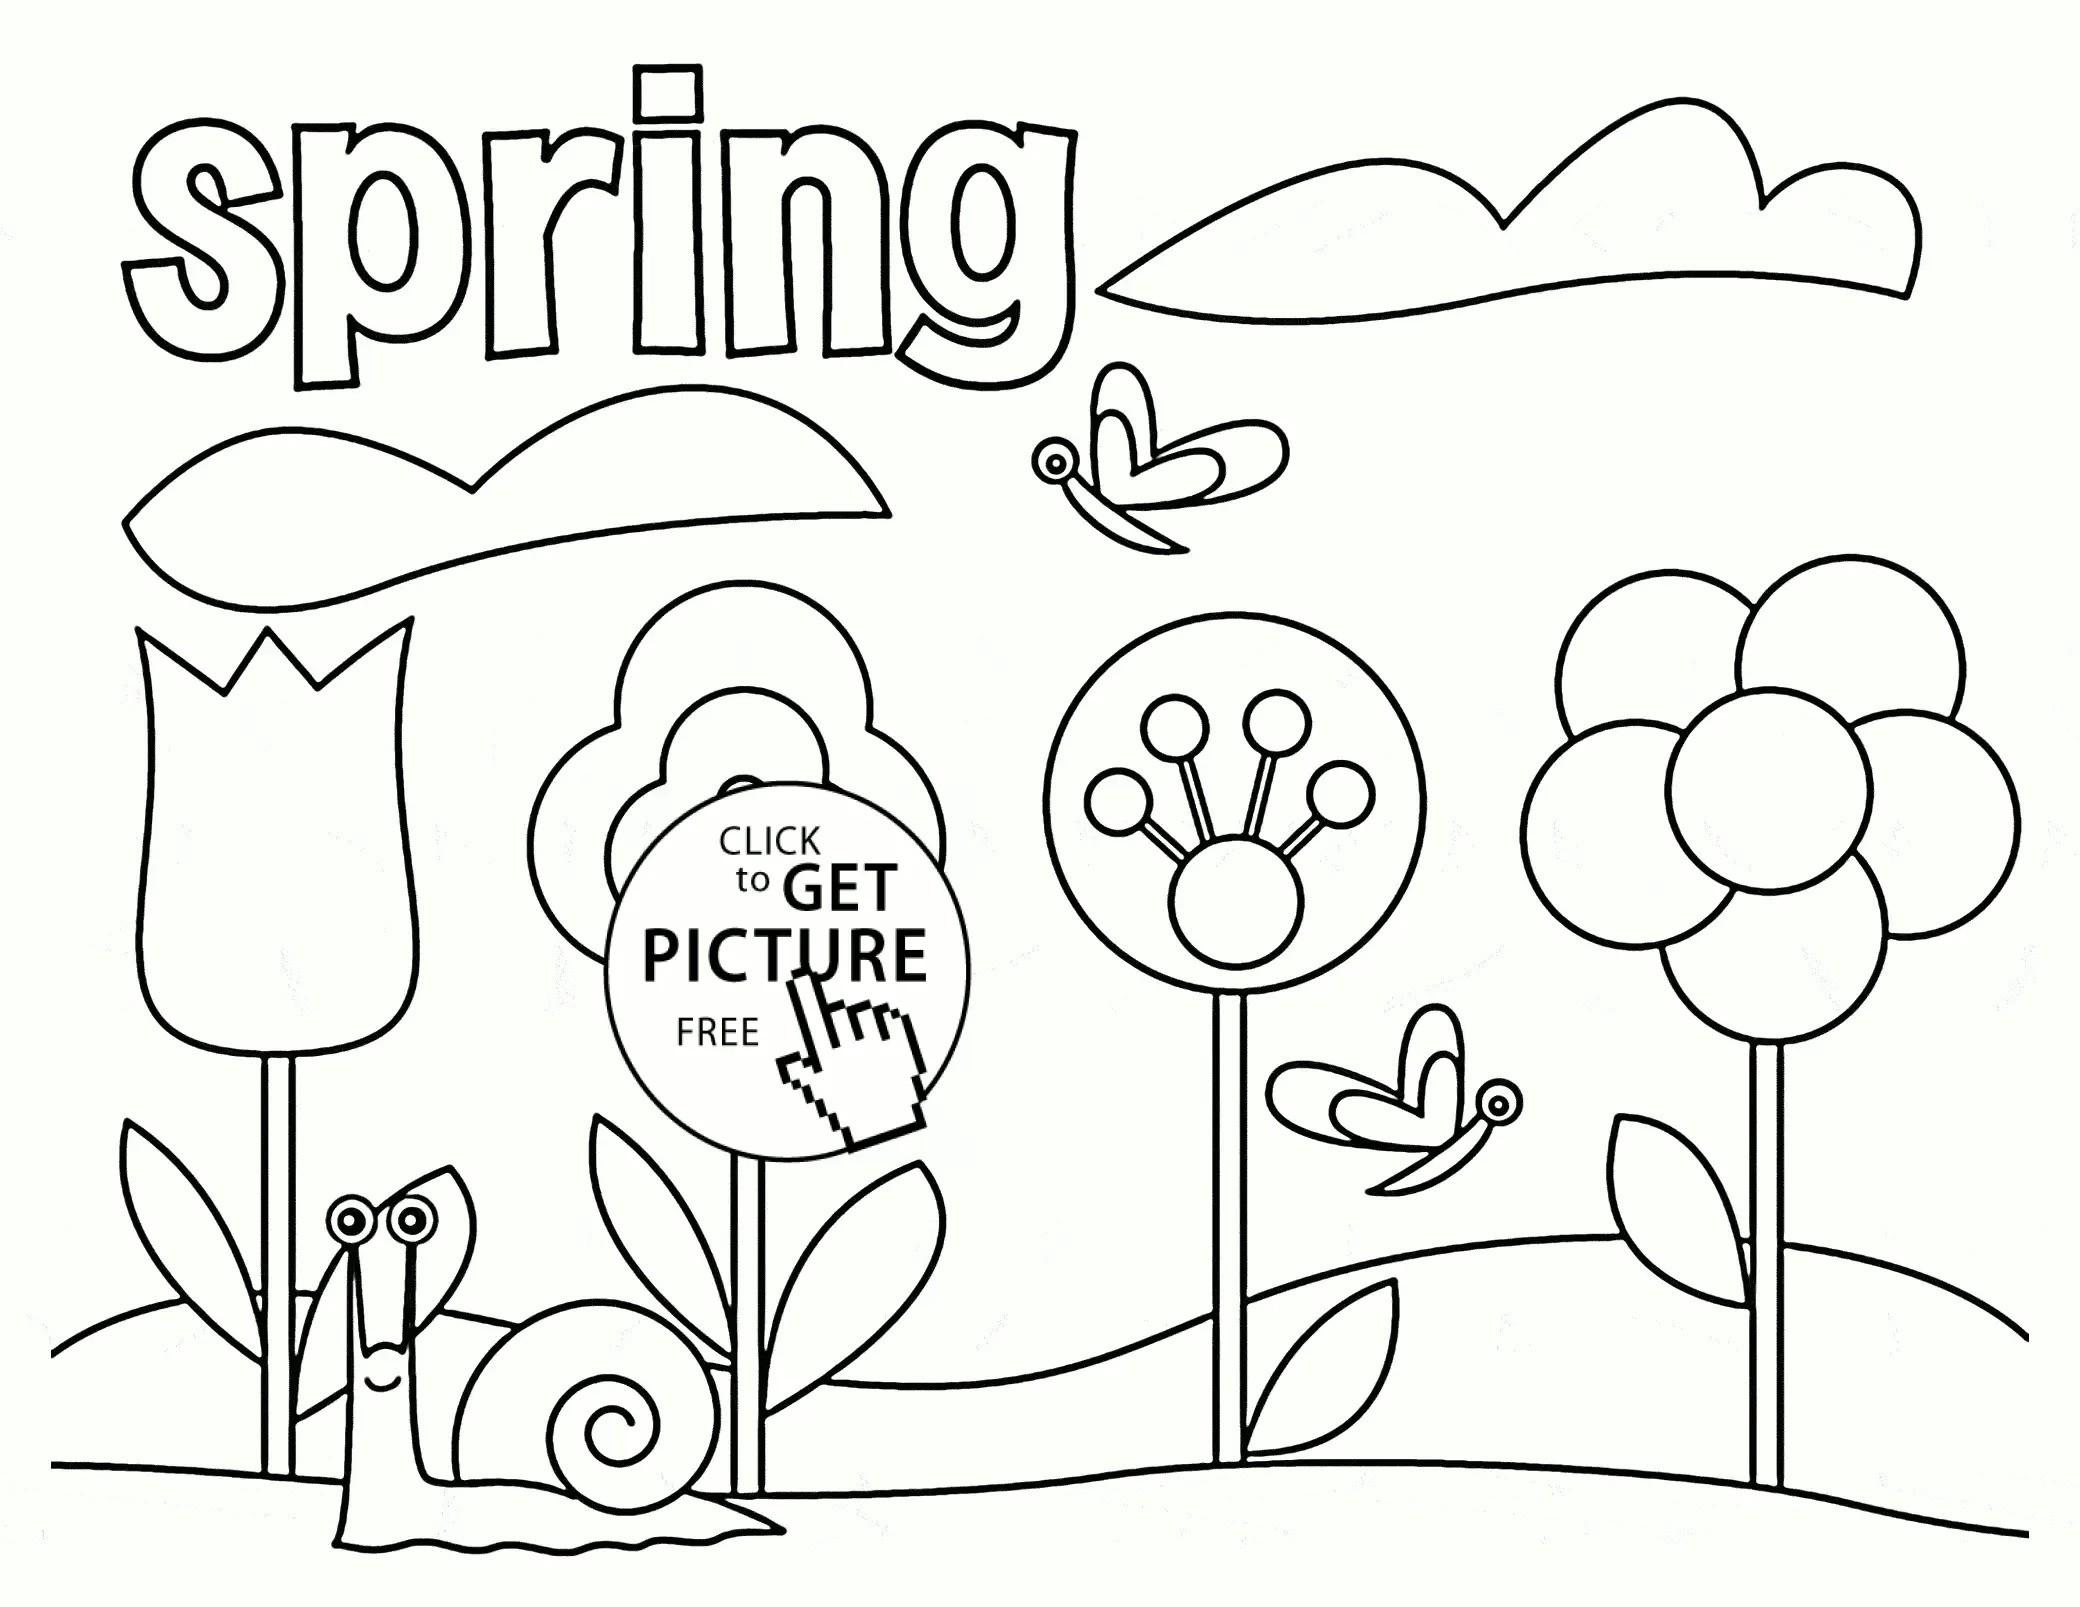 Spring Tree Coloring Page At Getdrawings